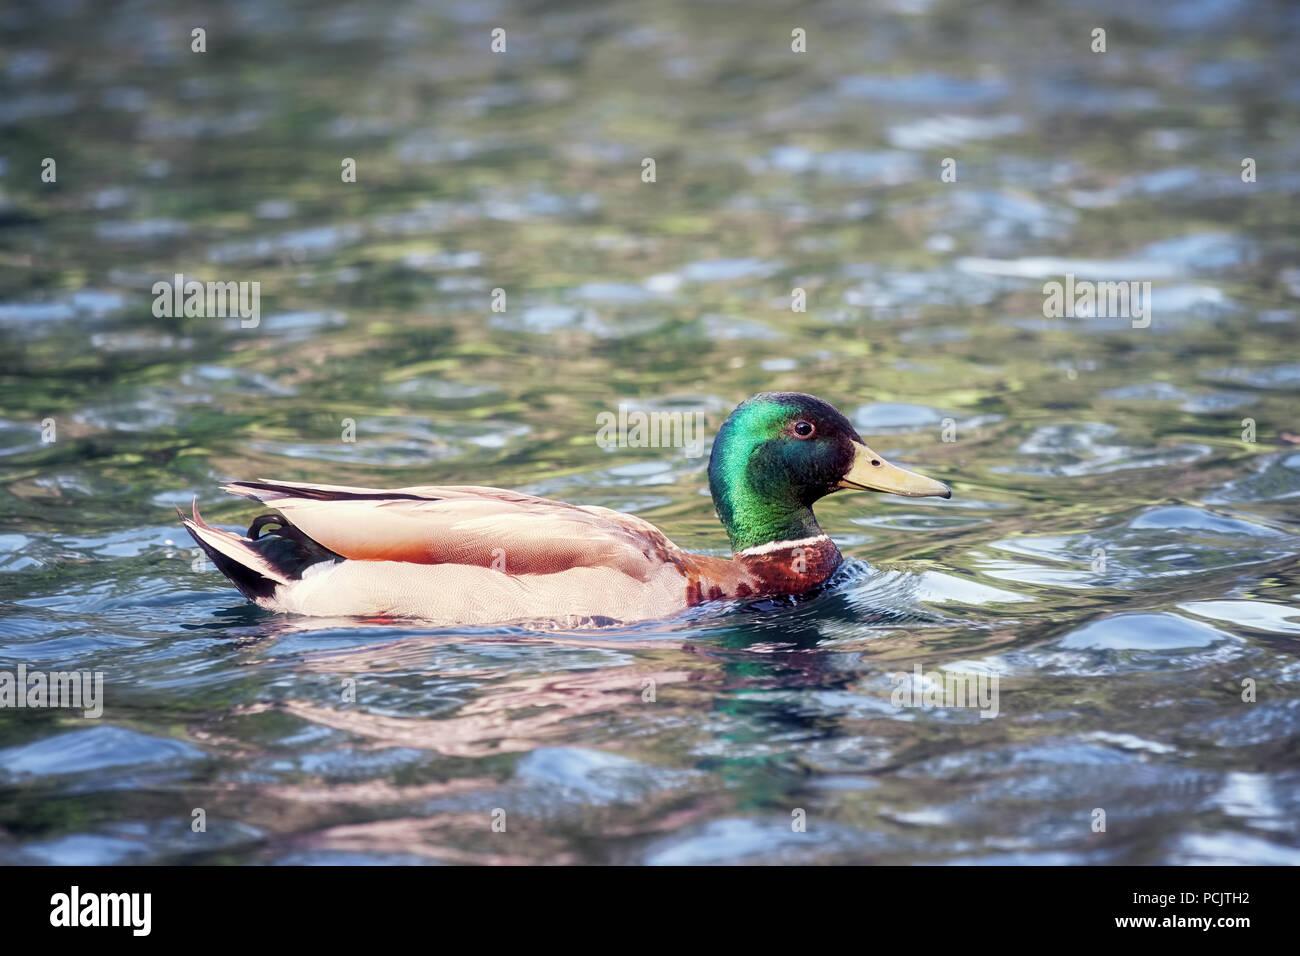 Duck Mallard Anas platyrhynchos anatidae swimming on a pond - Stock Image